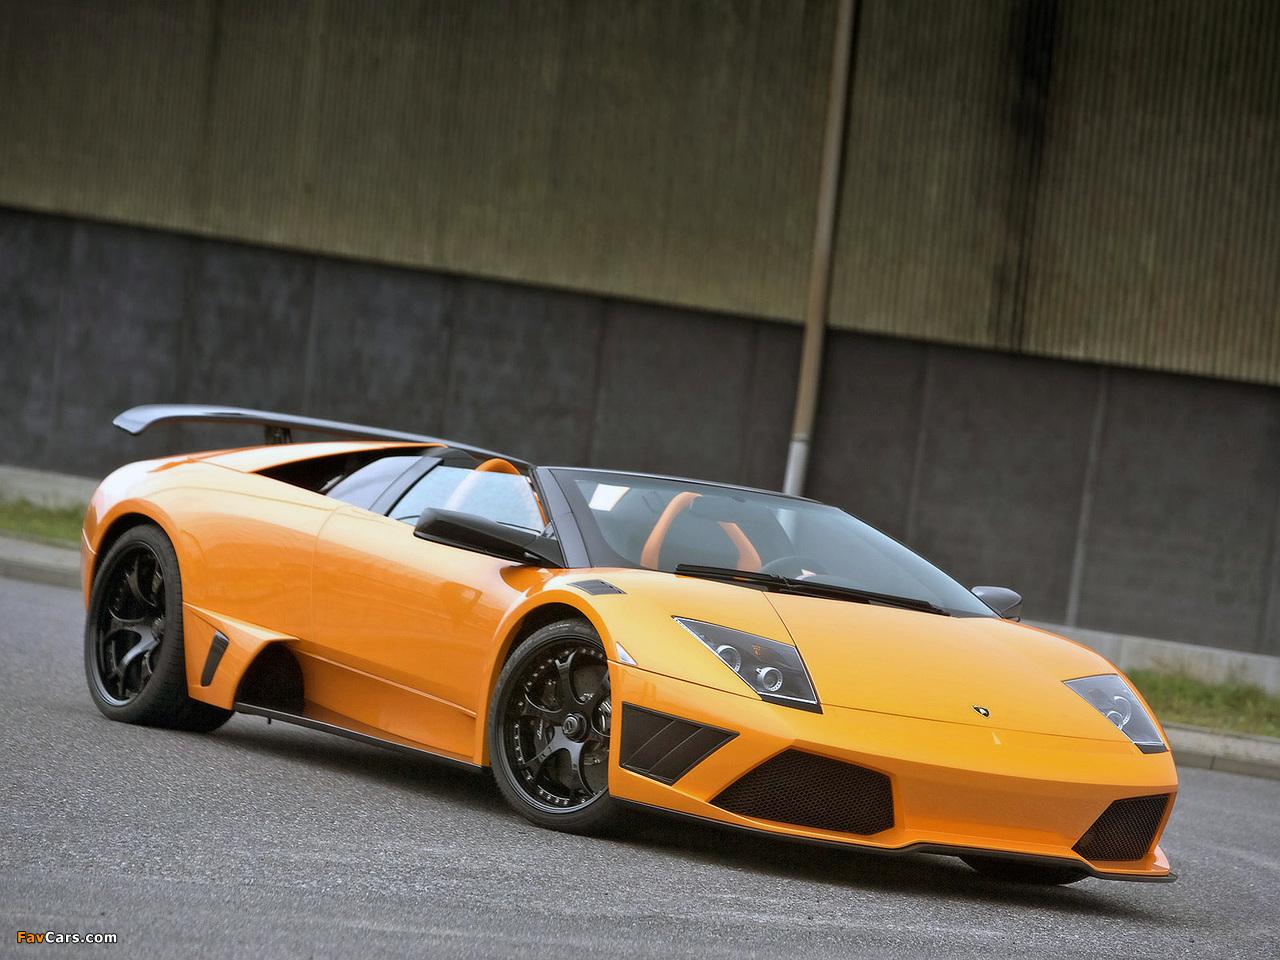 IMSA Lamborghini Murcielago LP640 Roadster 2008 images (1280 x 960)